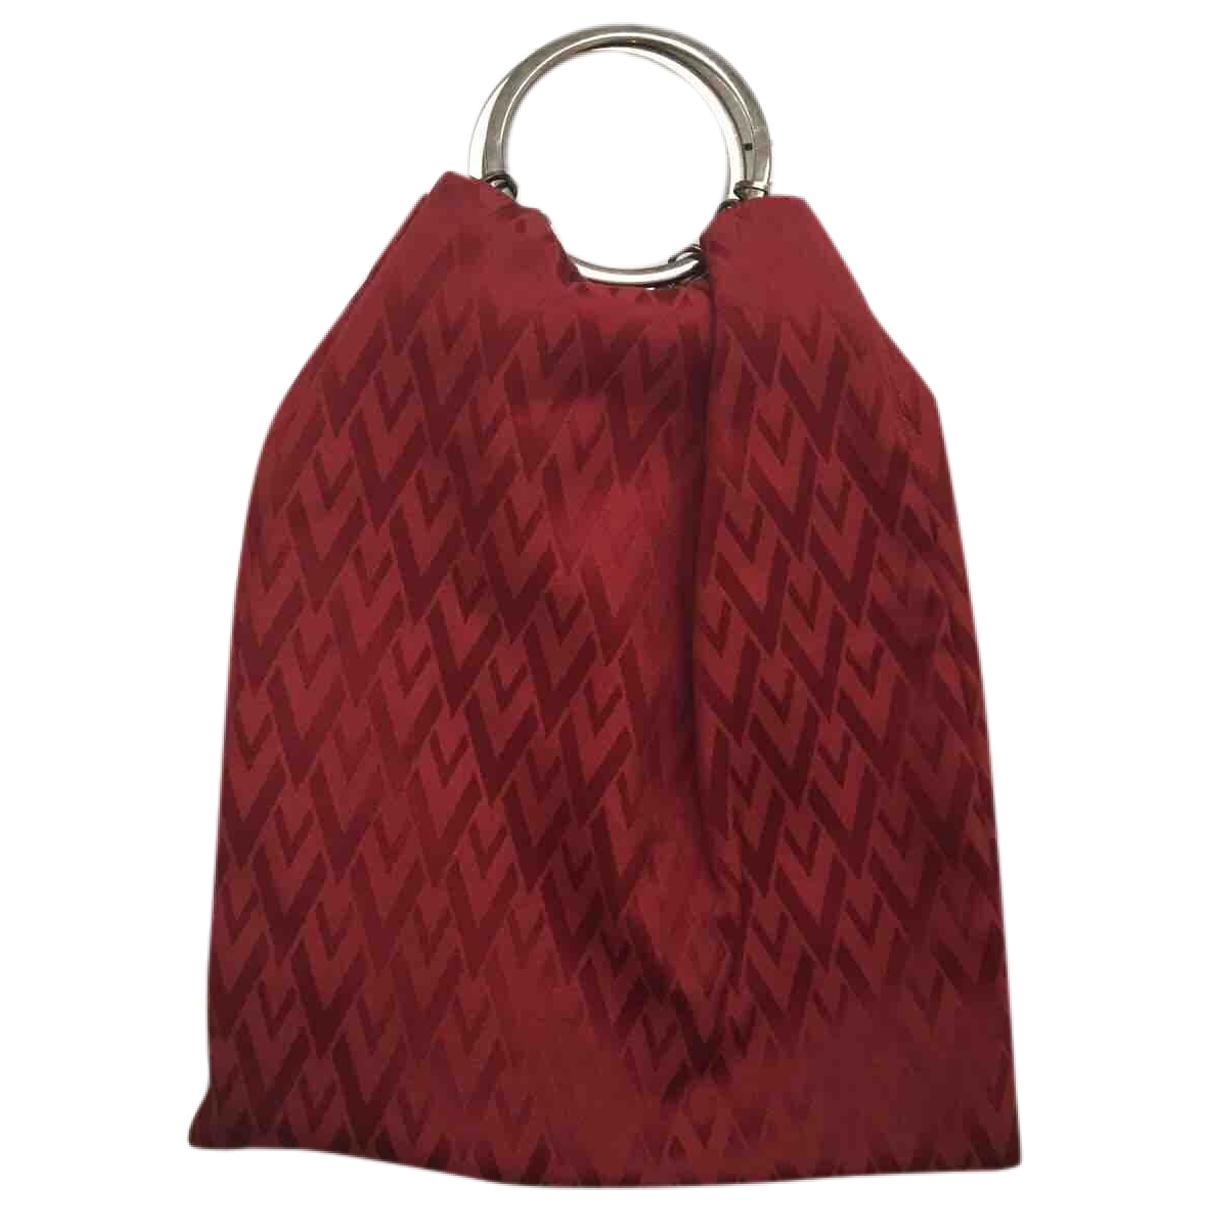 Valentino Garavani \N Red Cloth handbag for Women \N